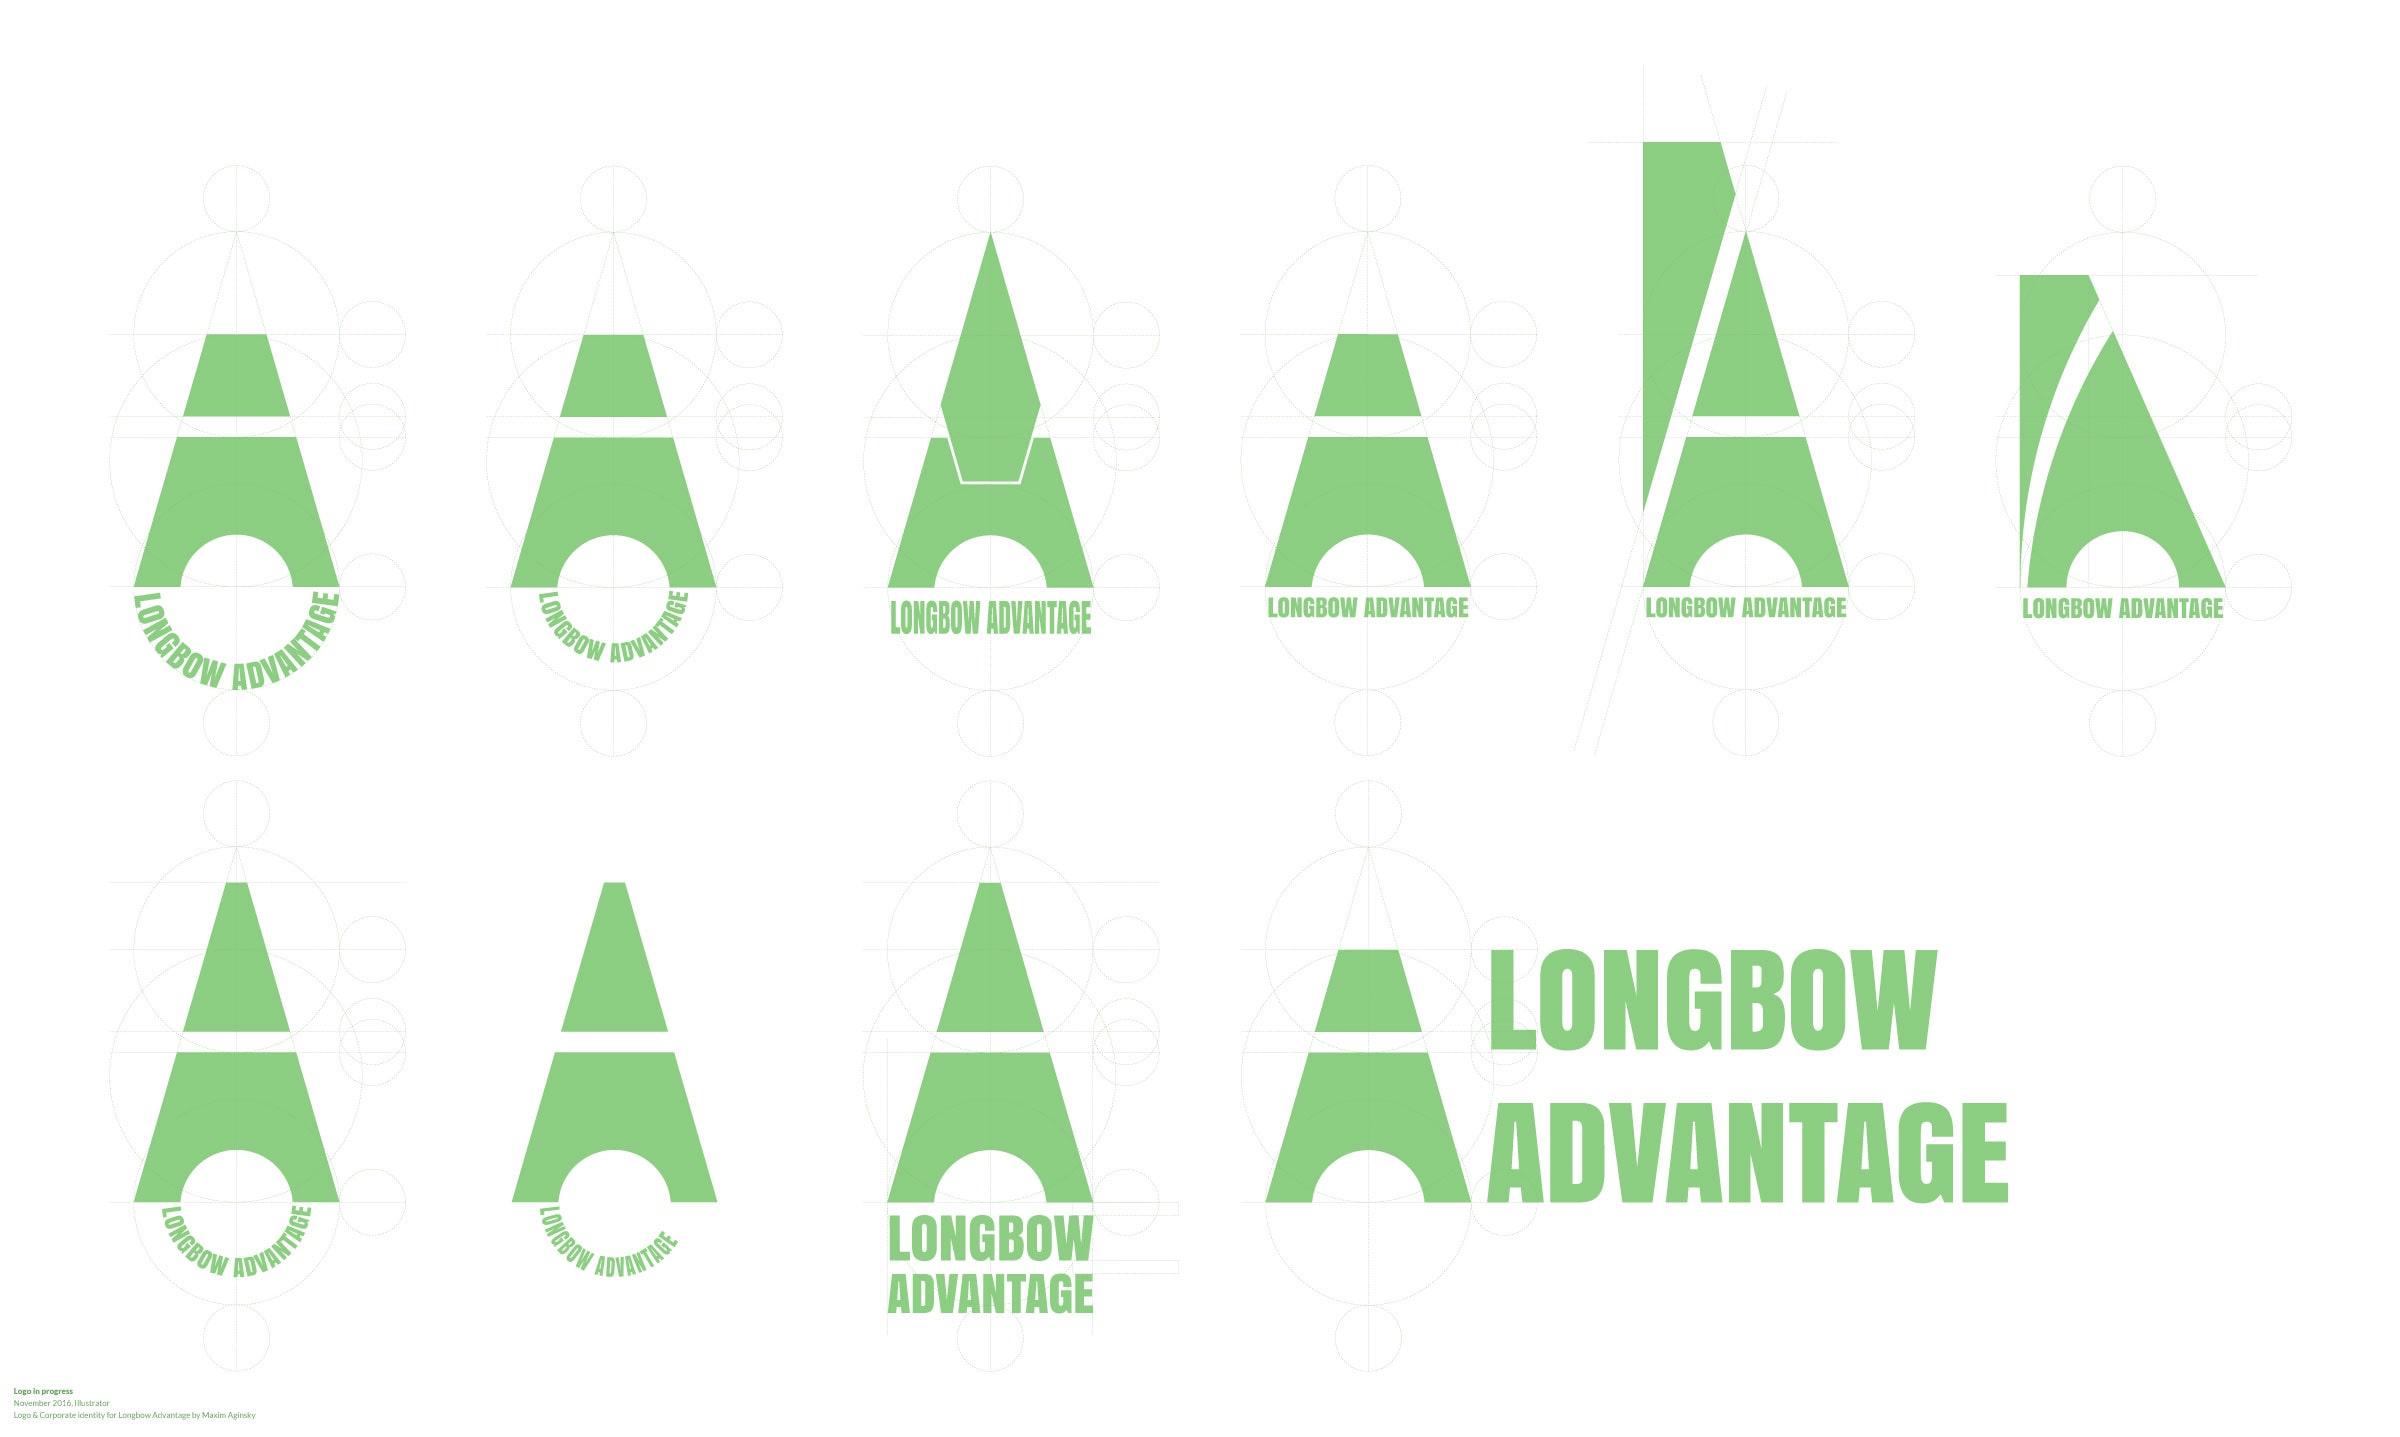 Longbow Advantage logo in progress examples